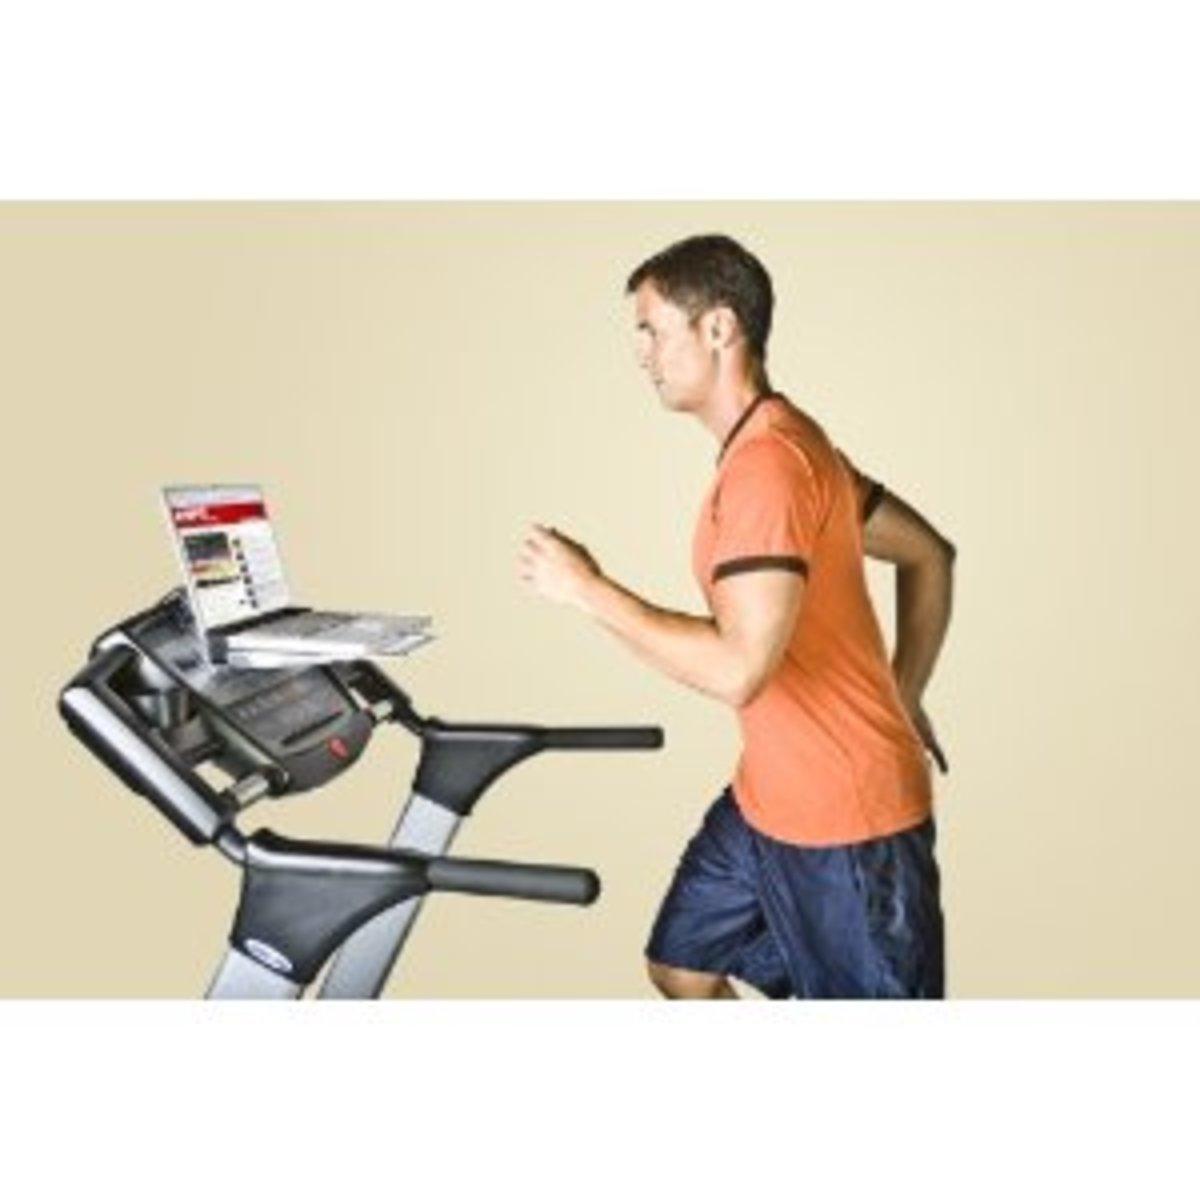 100-ways-to-exercise